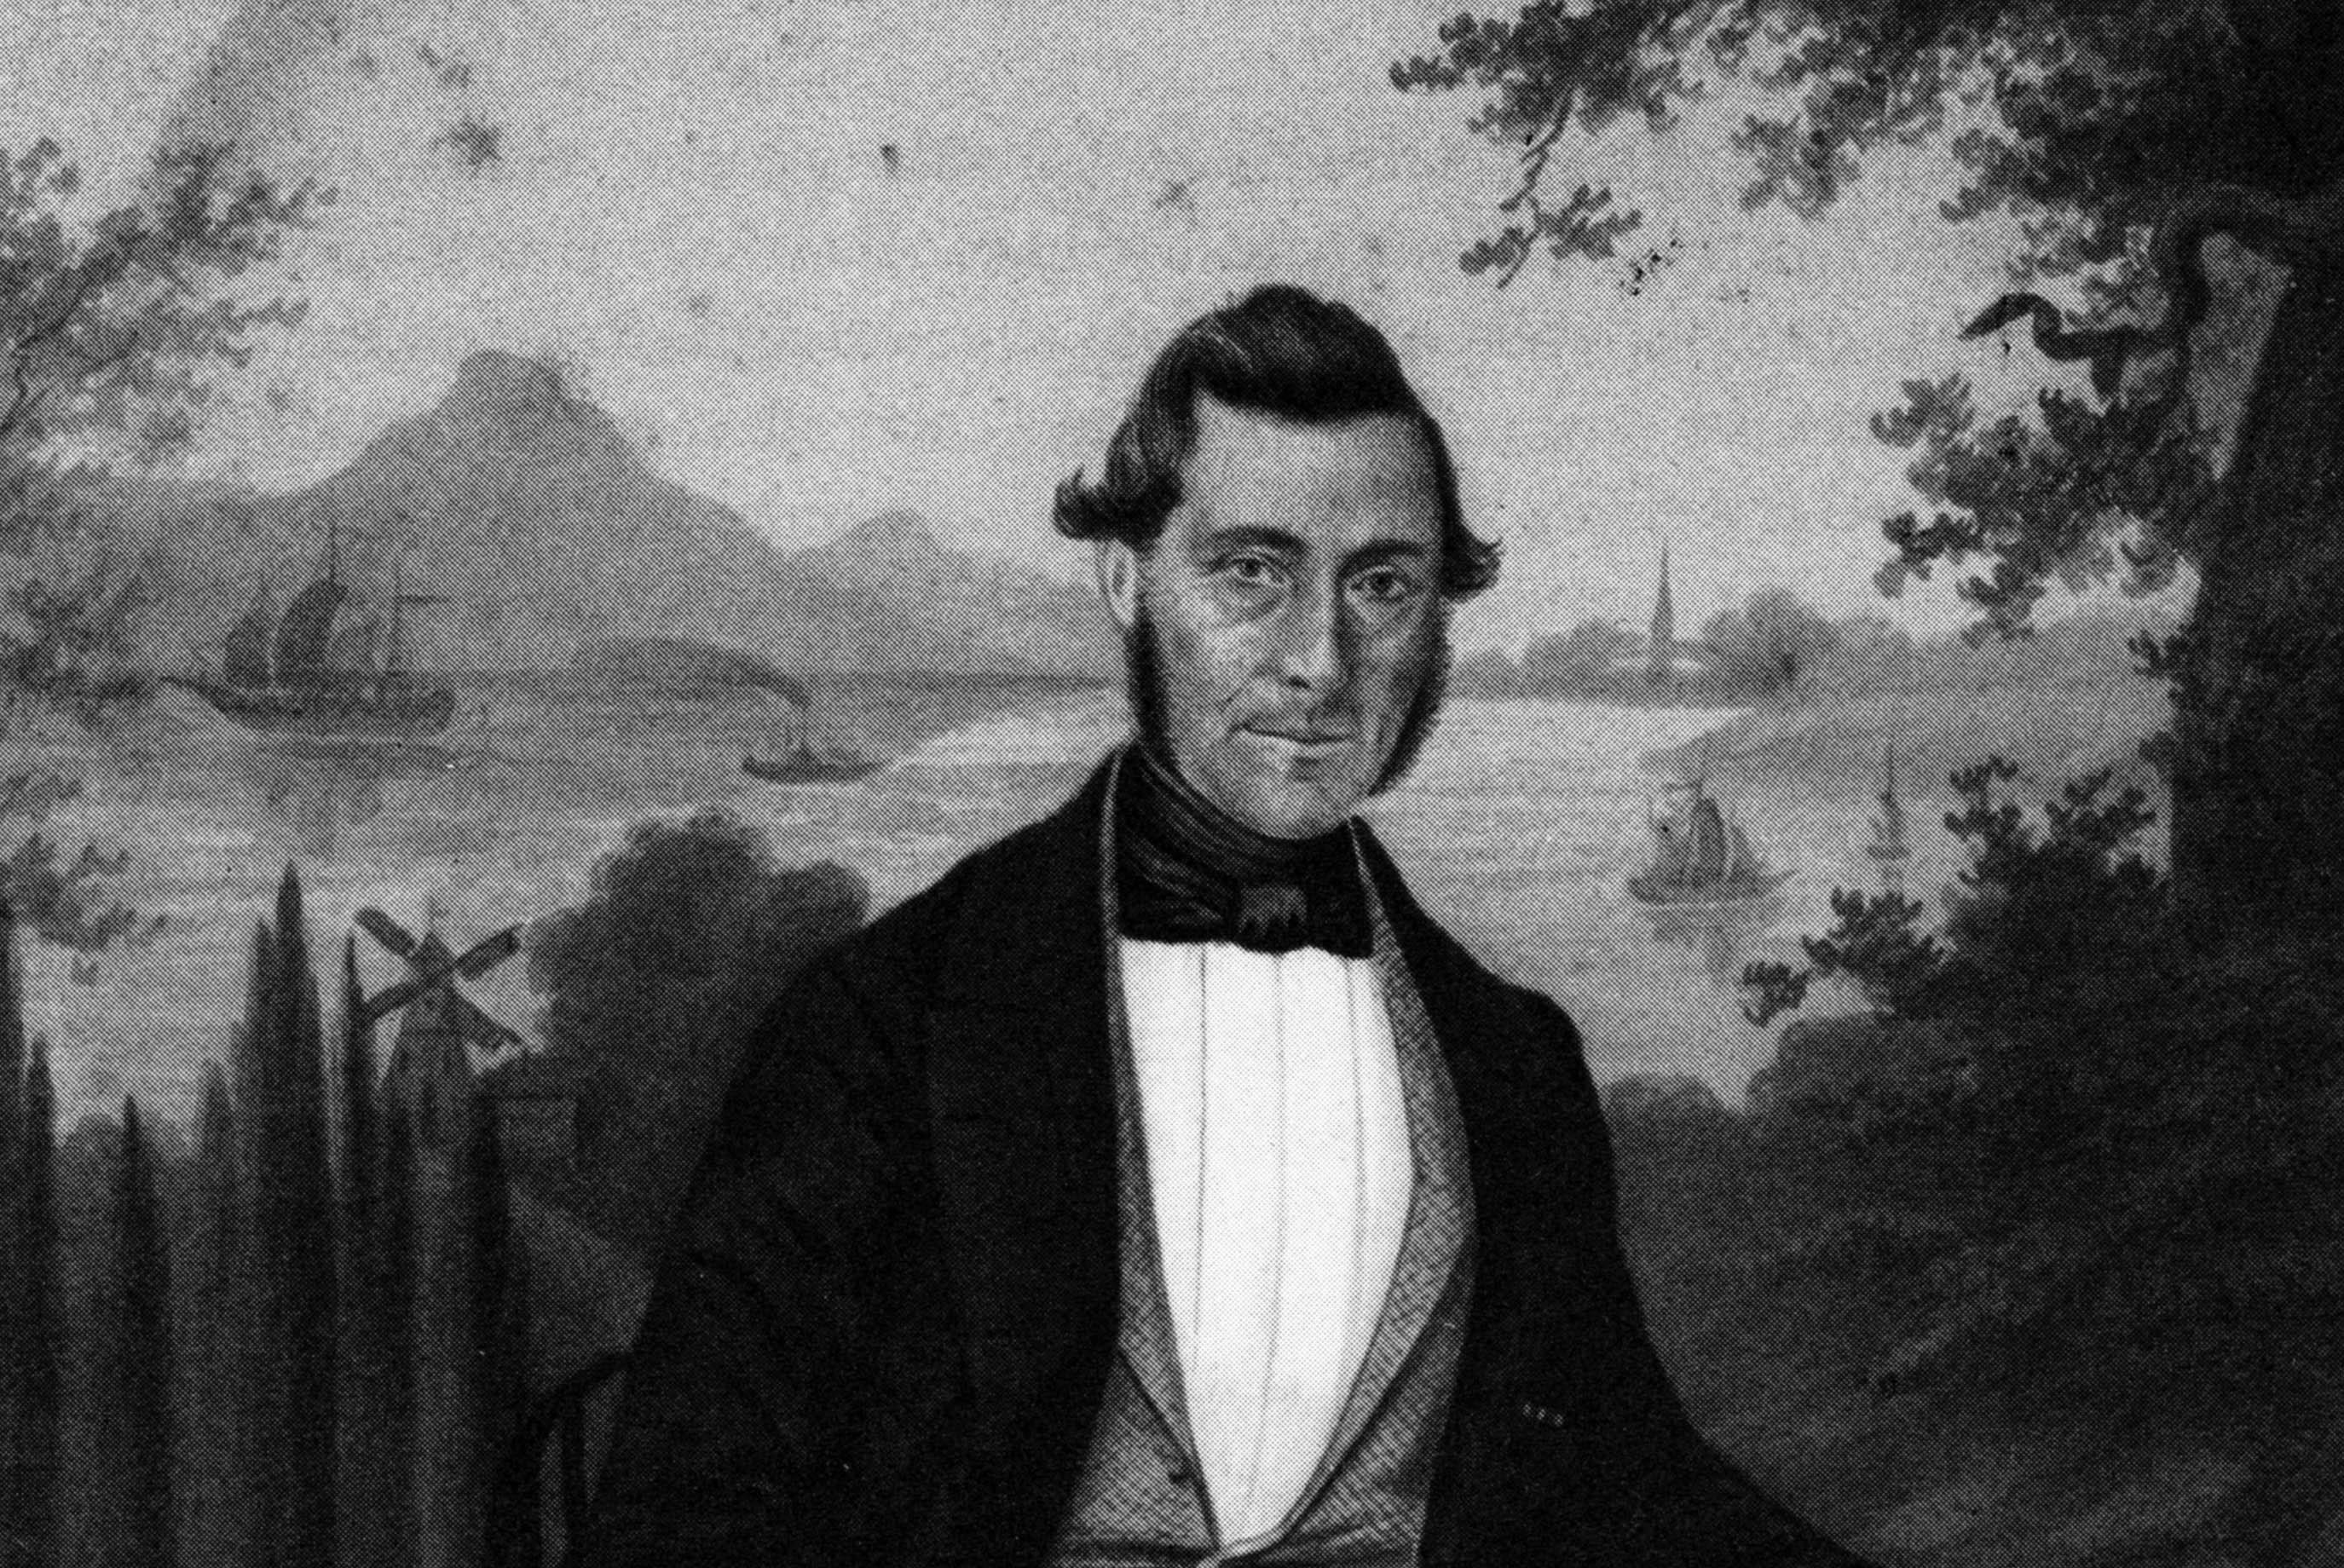 Portret Notaris Kikkert, initiatiefnemer Texelse Vuurtoren